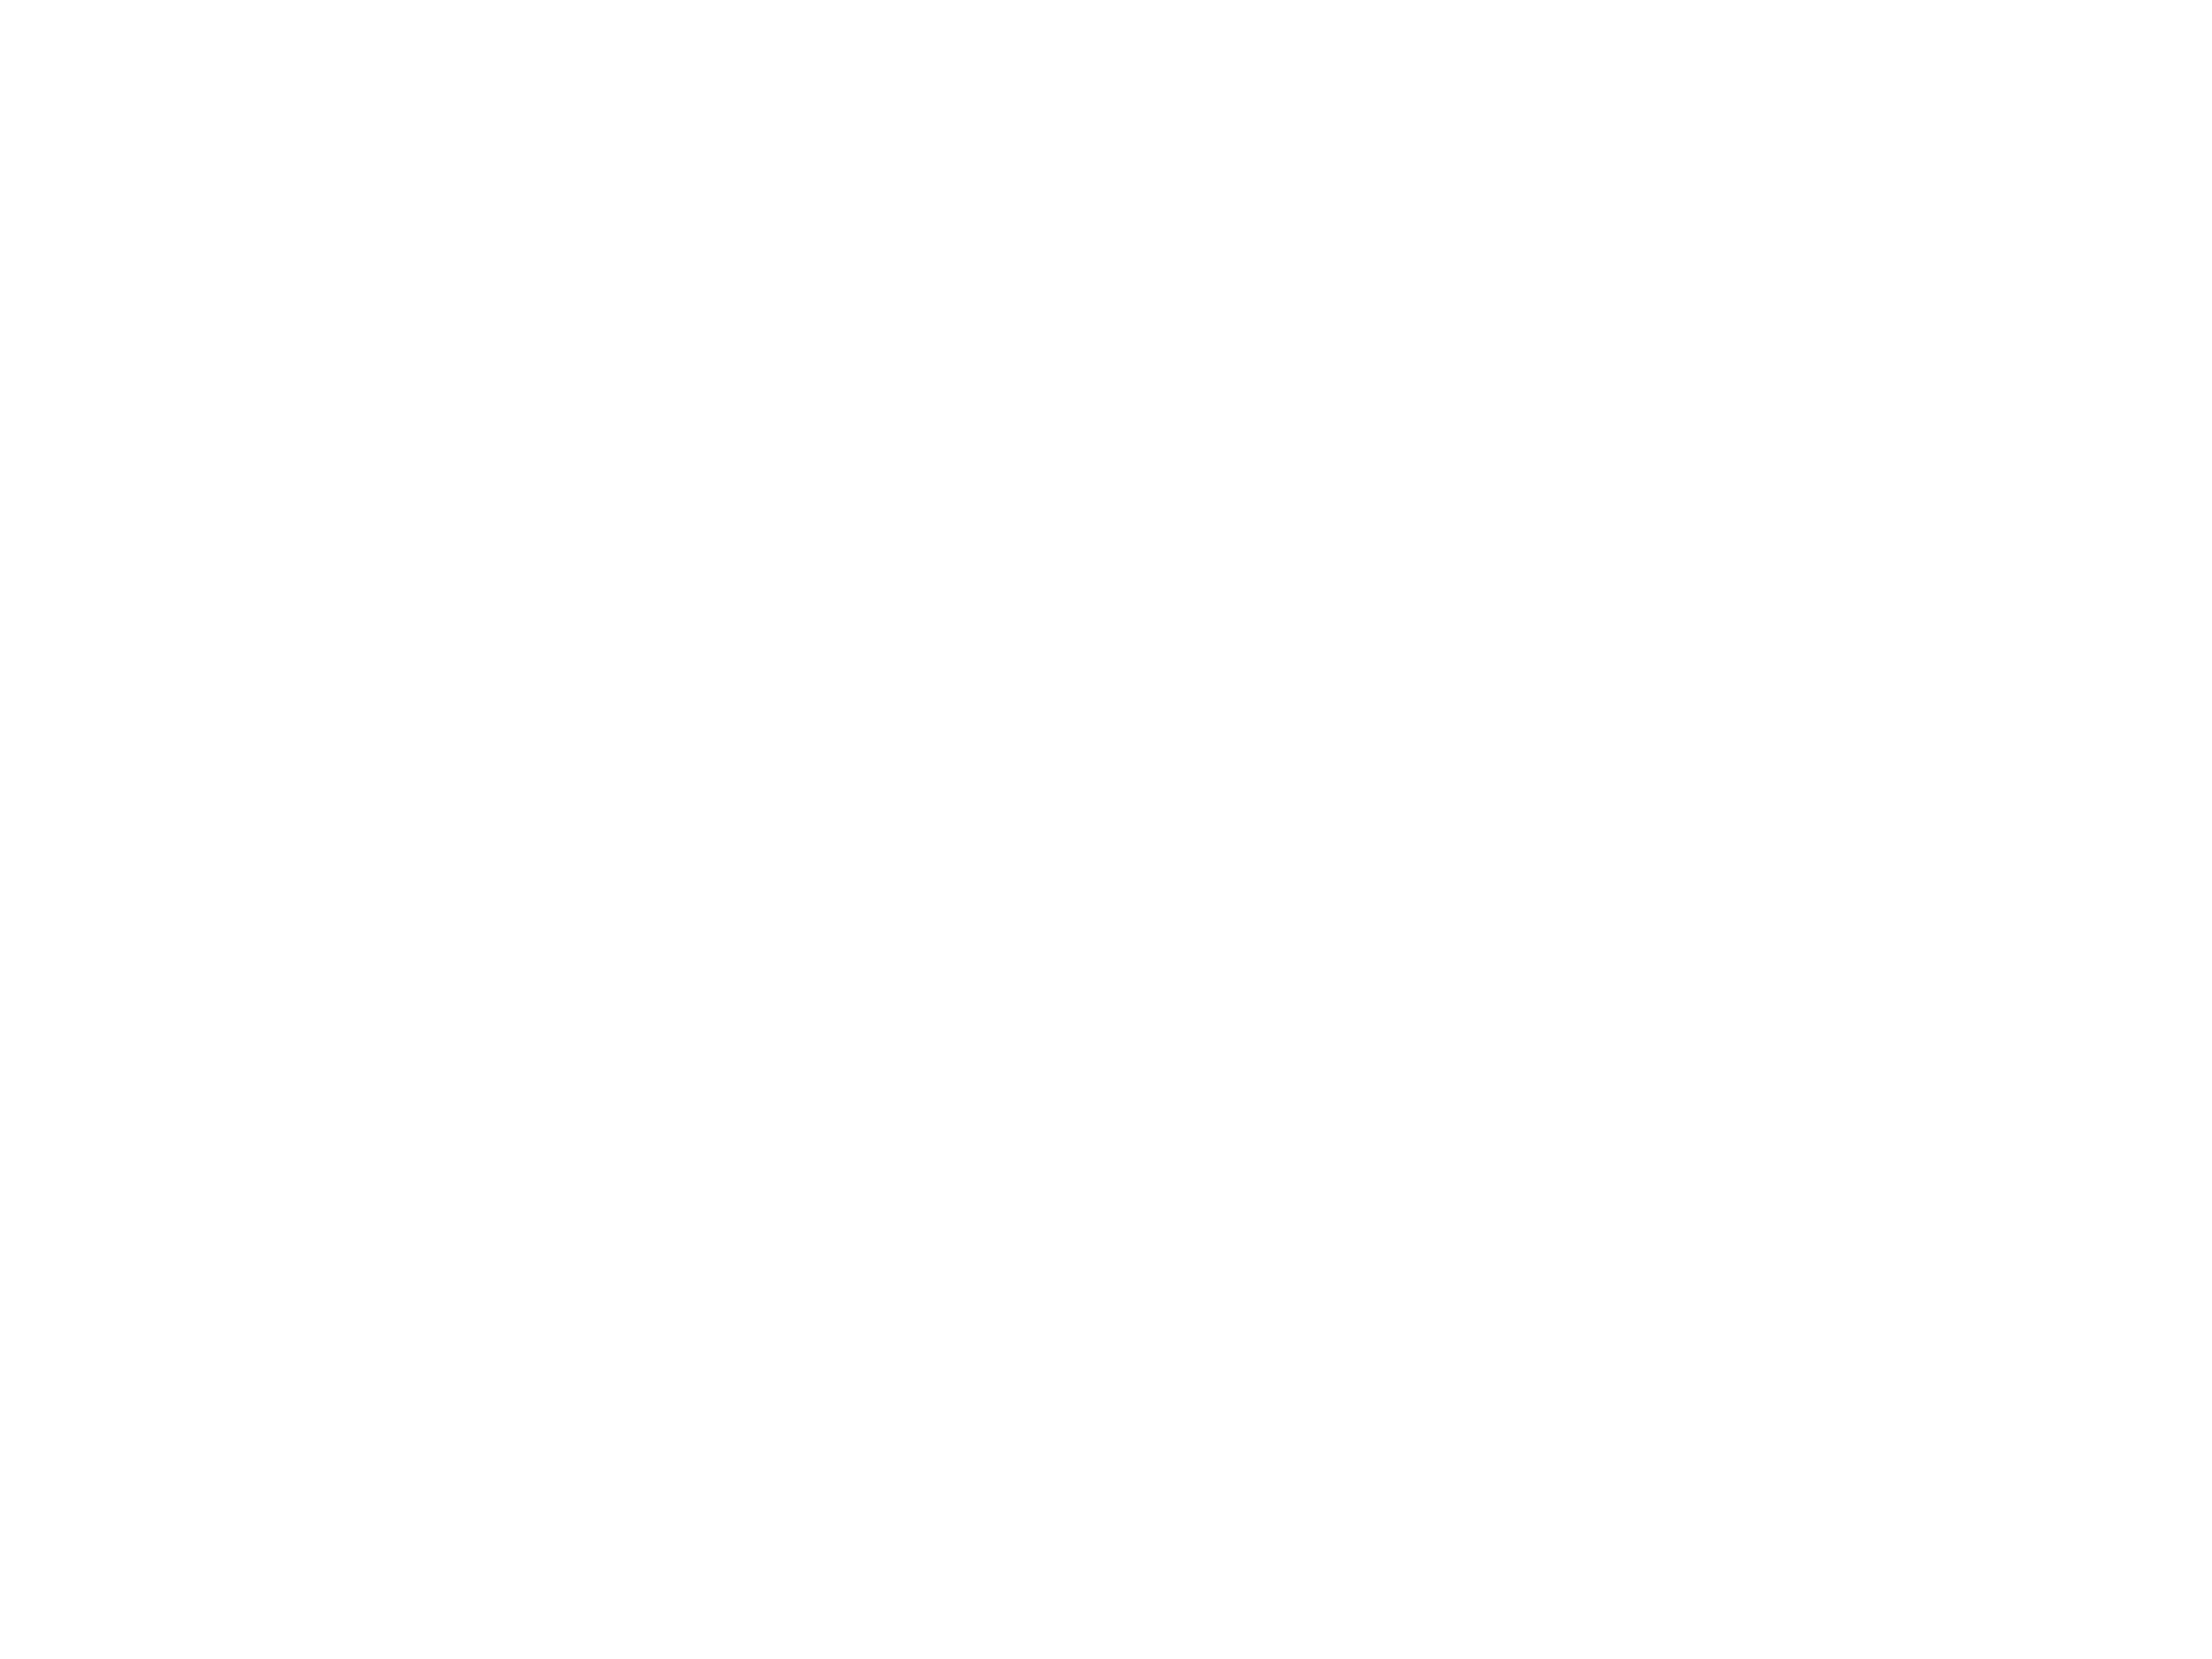 img_1552